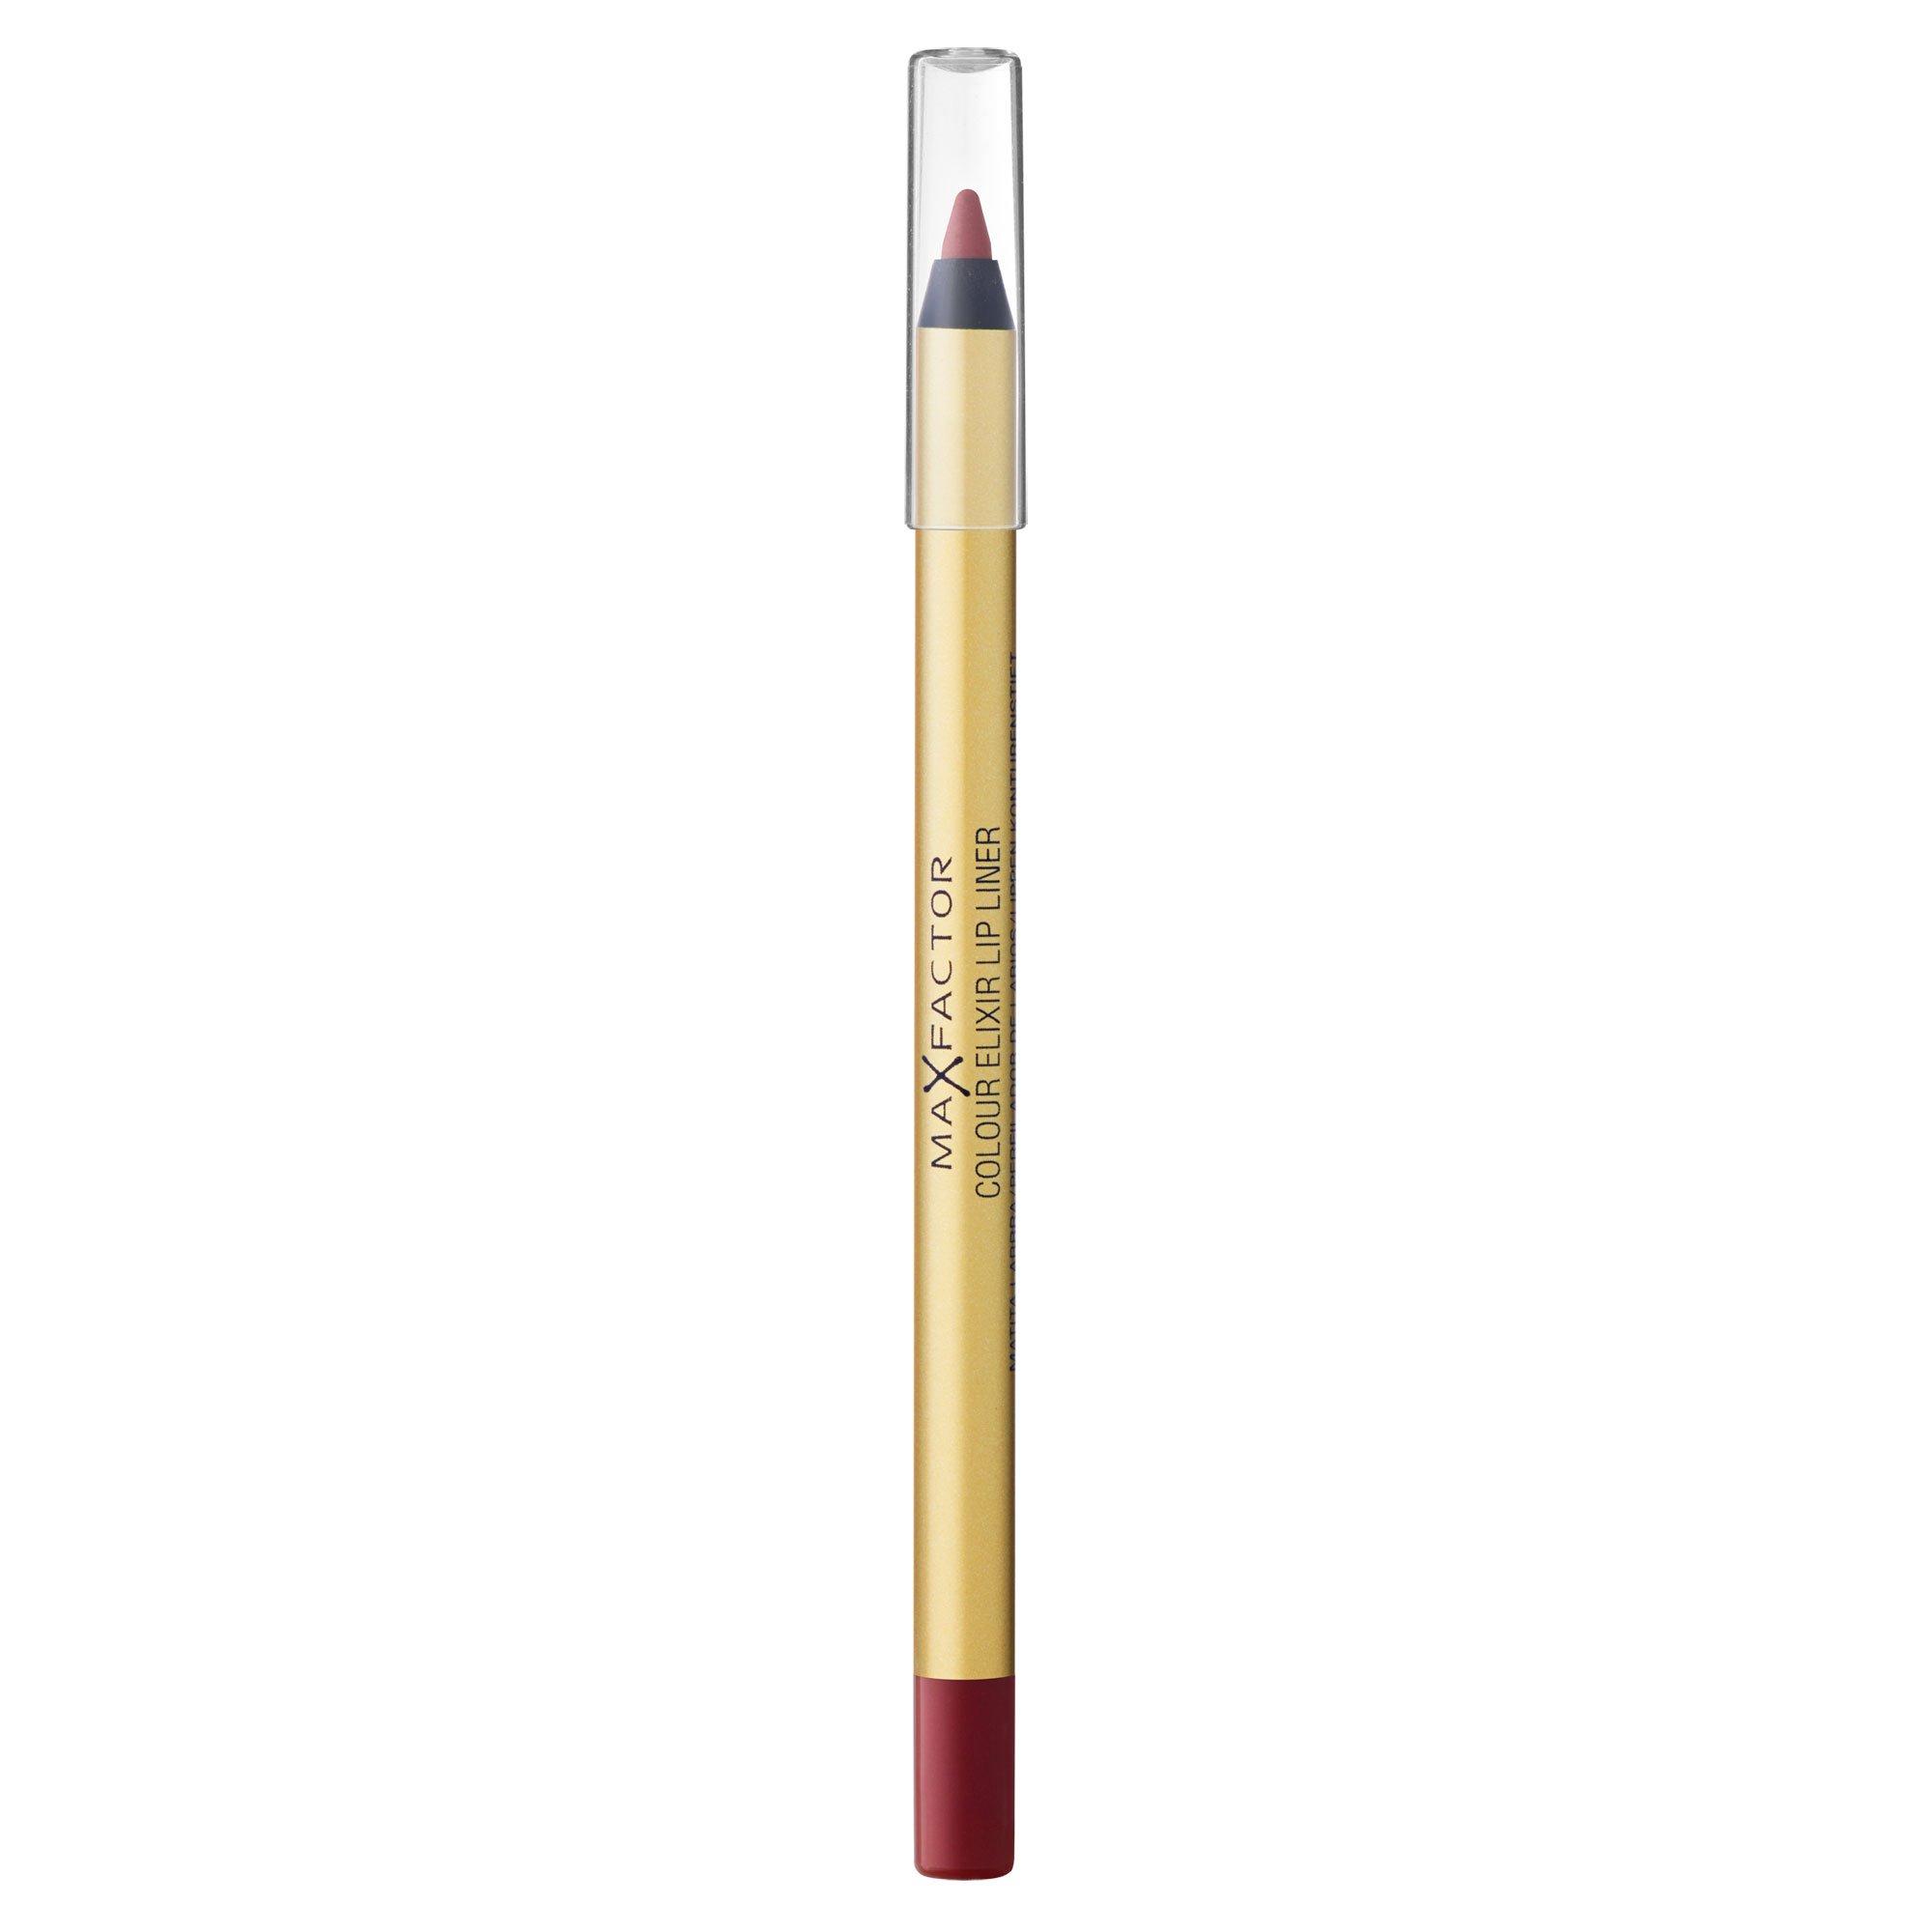 Max Factor - Colour Elixir Lipliner - Red Blush